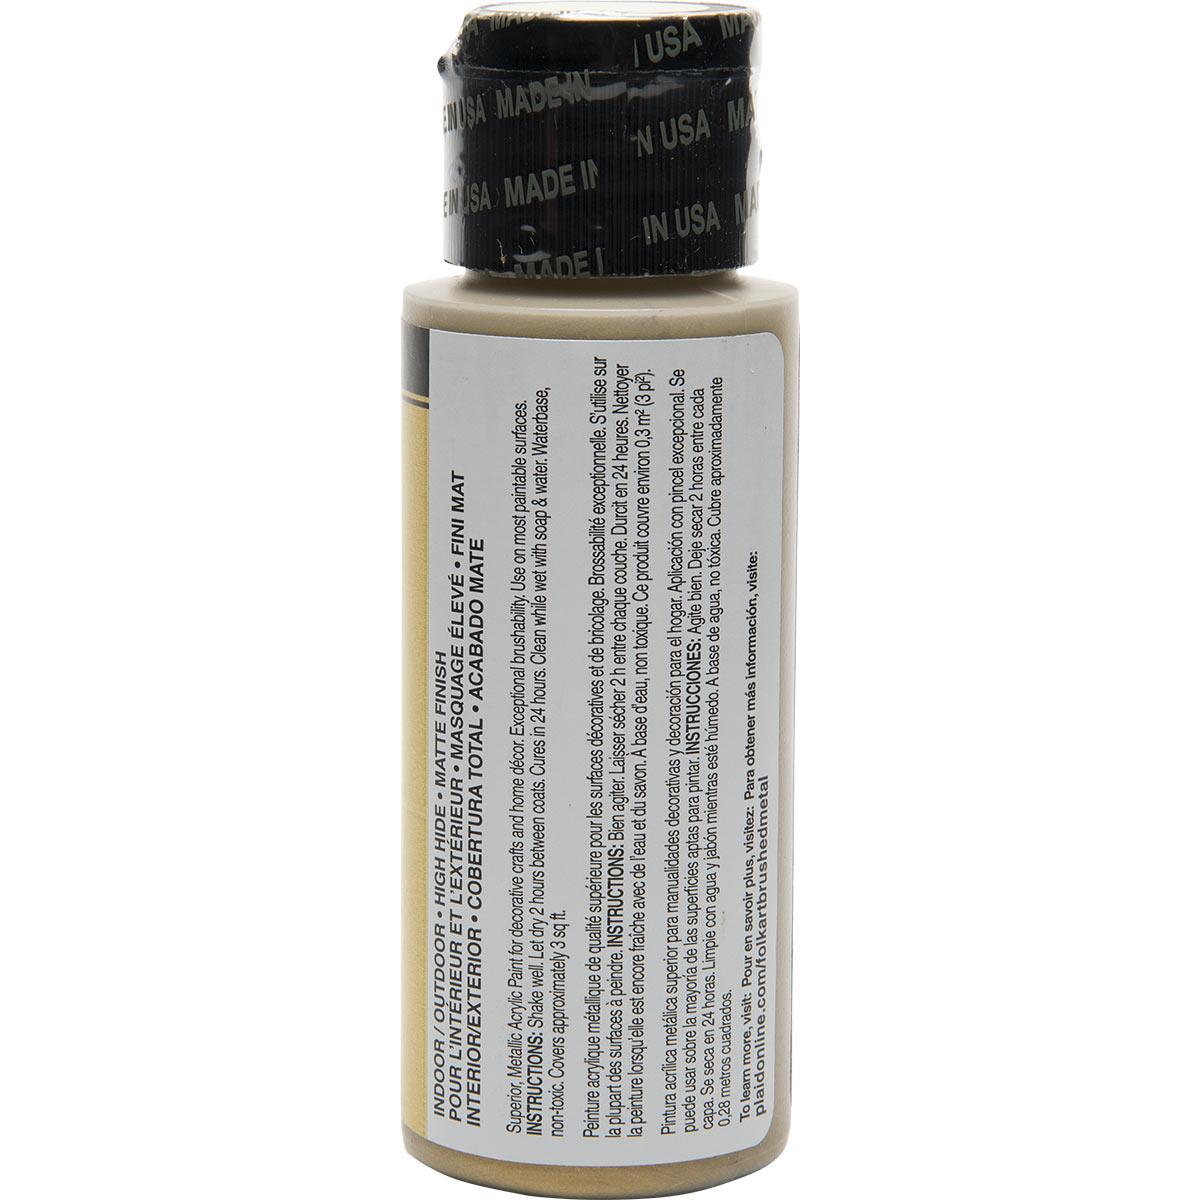 FolkArt ® Brushed Metal™ Acrylic Paint - Gold, 2 oz. - 5121